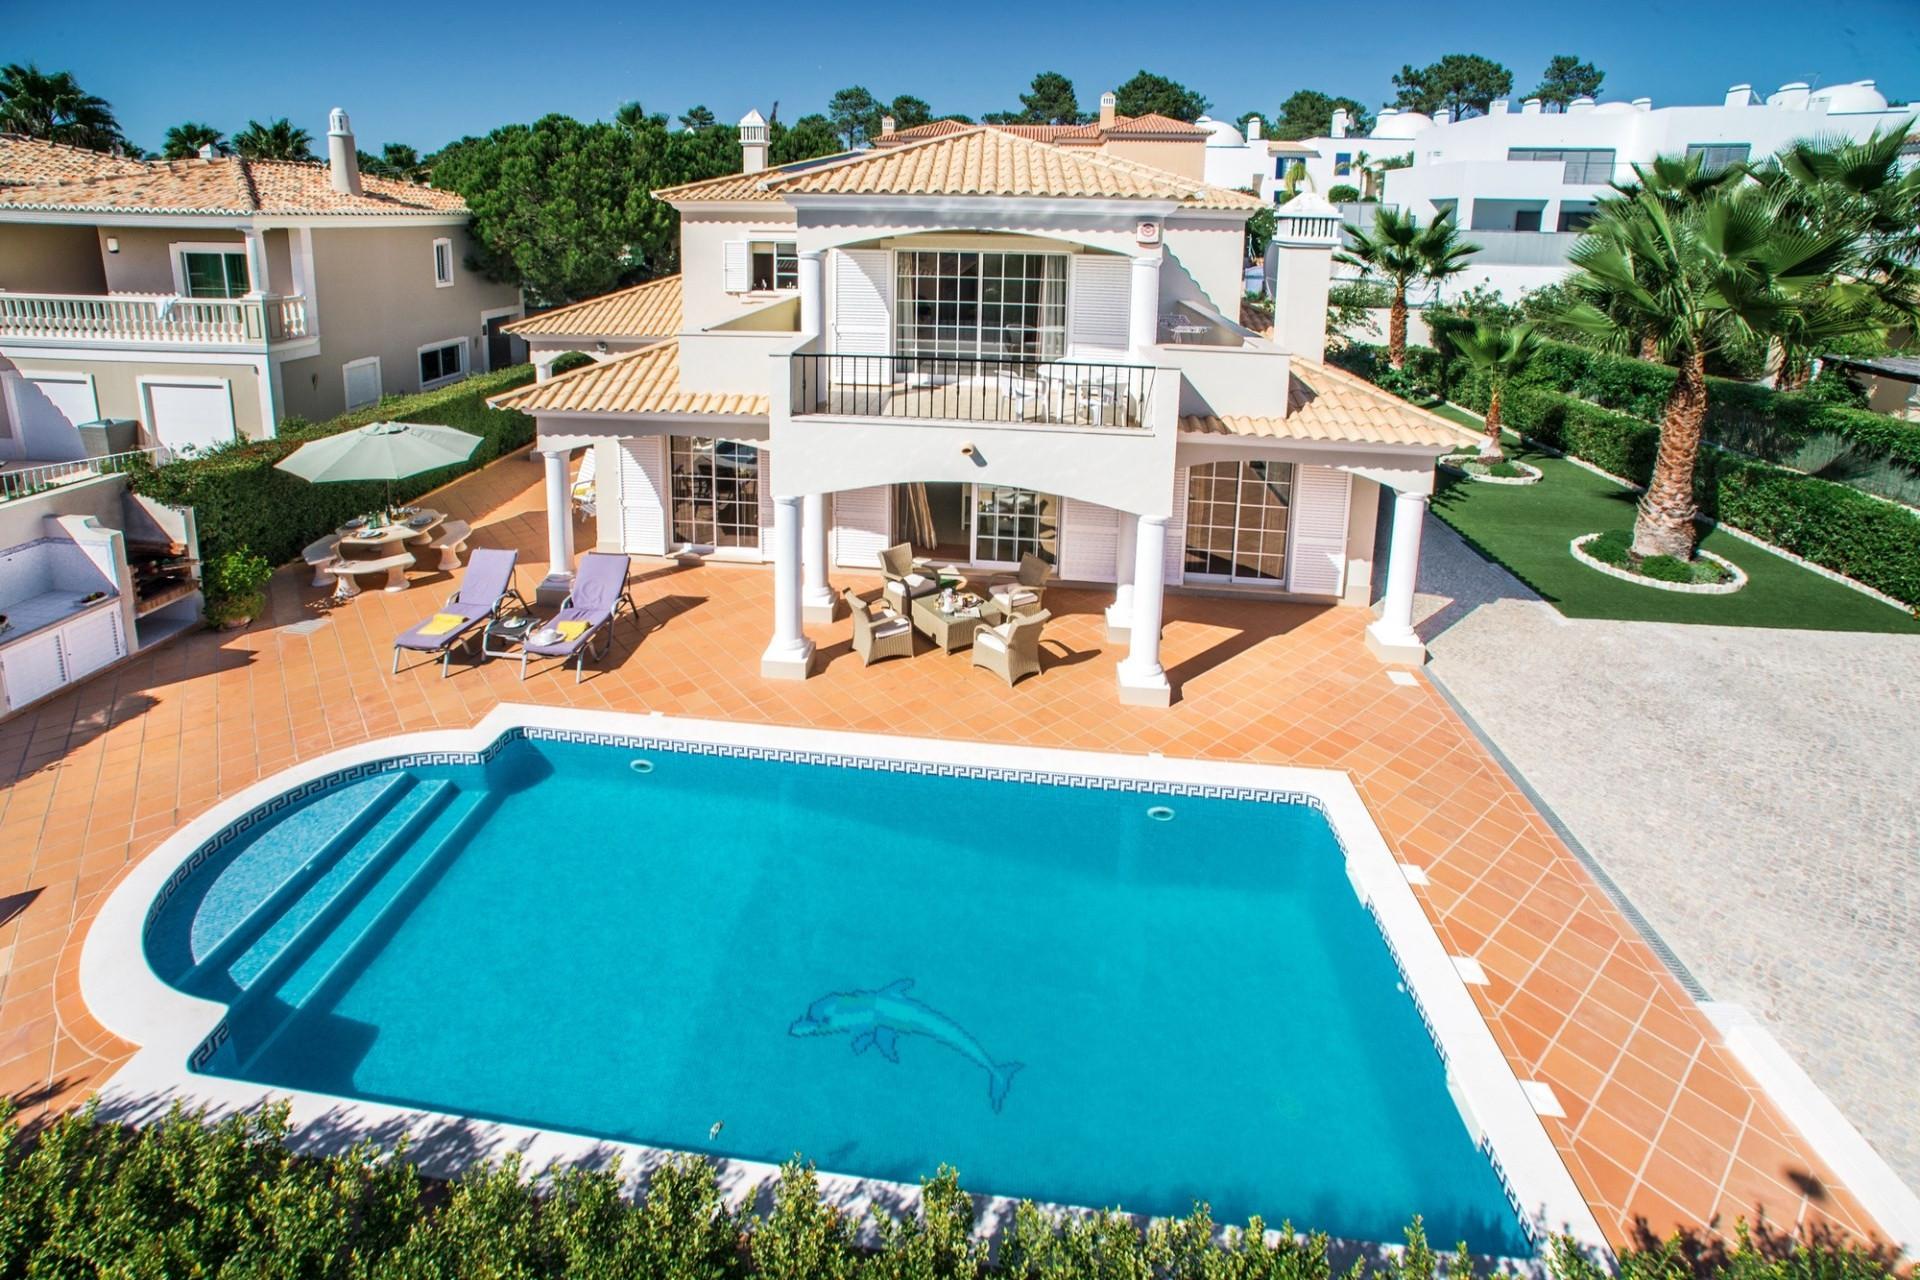 Algarve Villa Rentals Luxury 4 Bedroom Villa Varandas do Lago Private Heated Pool & BBQ